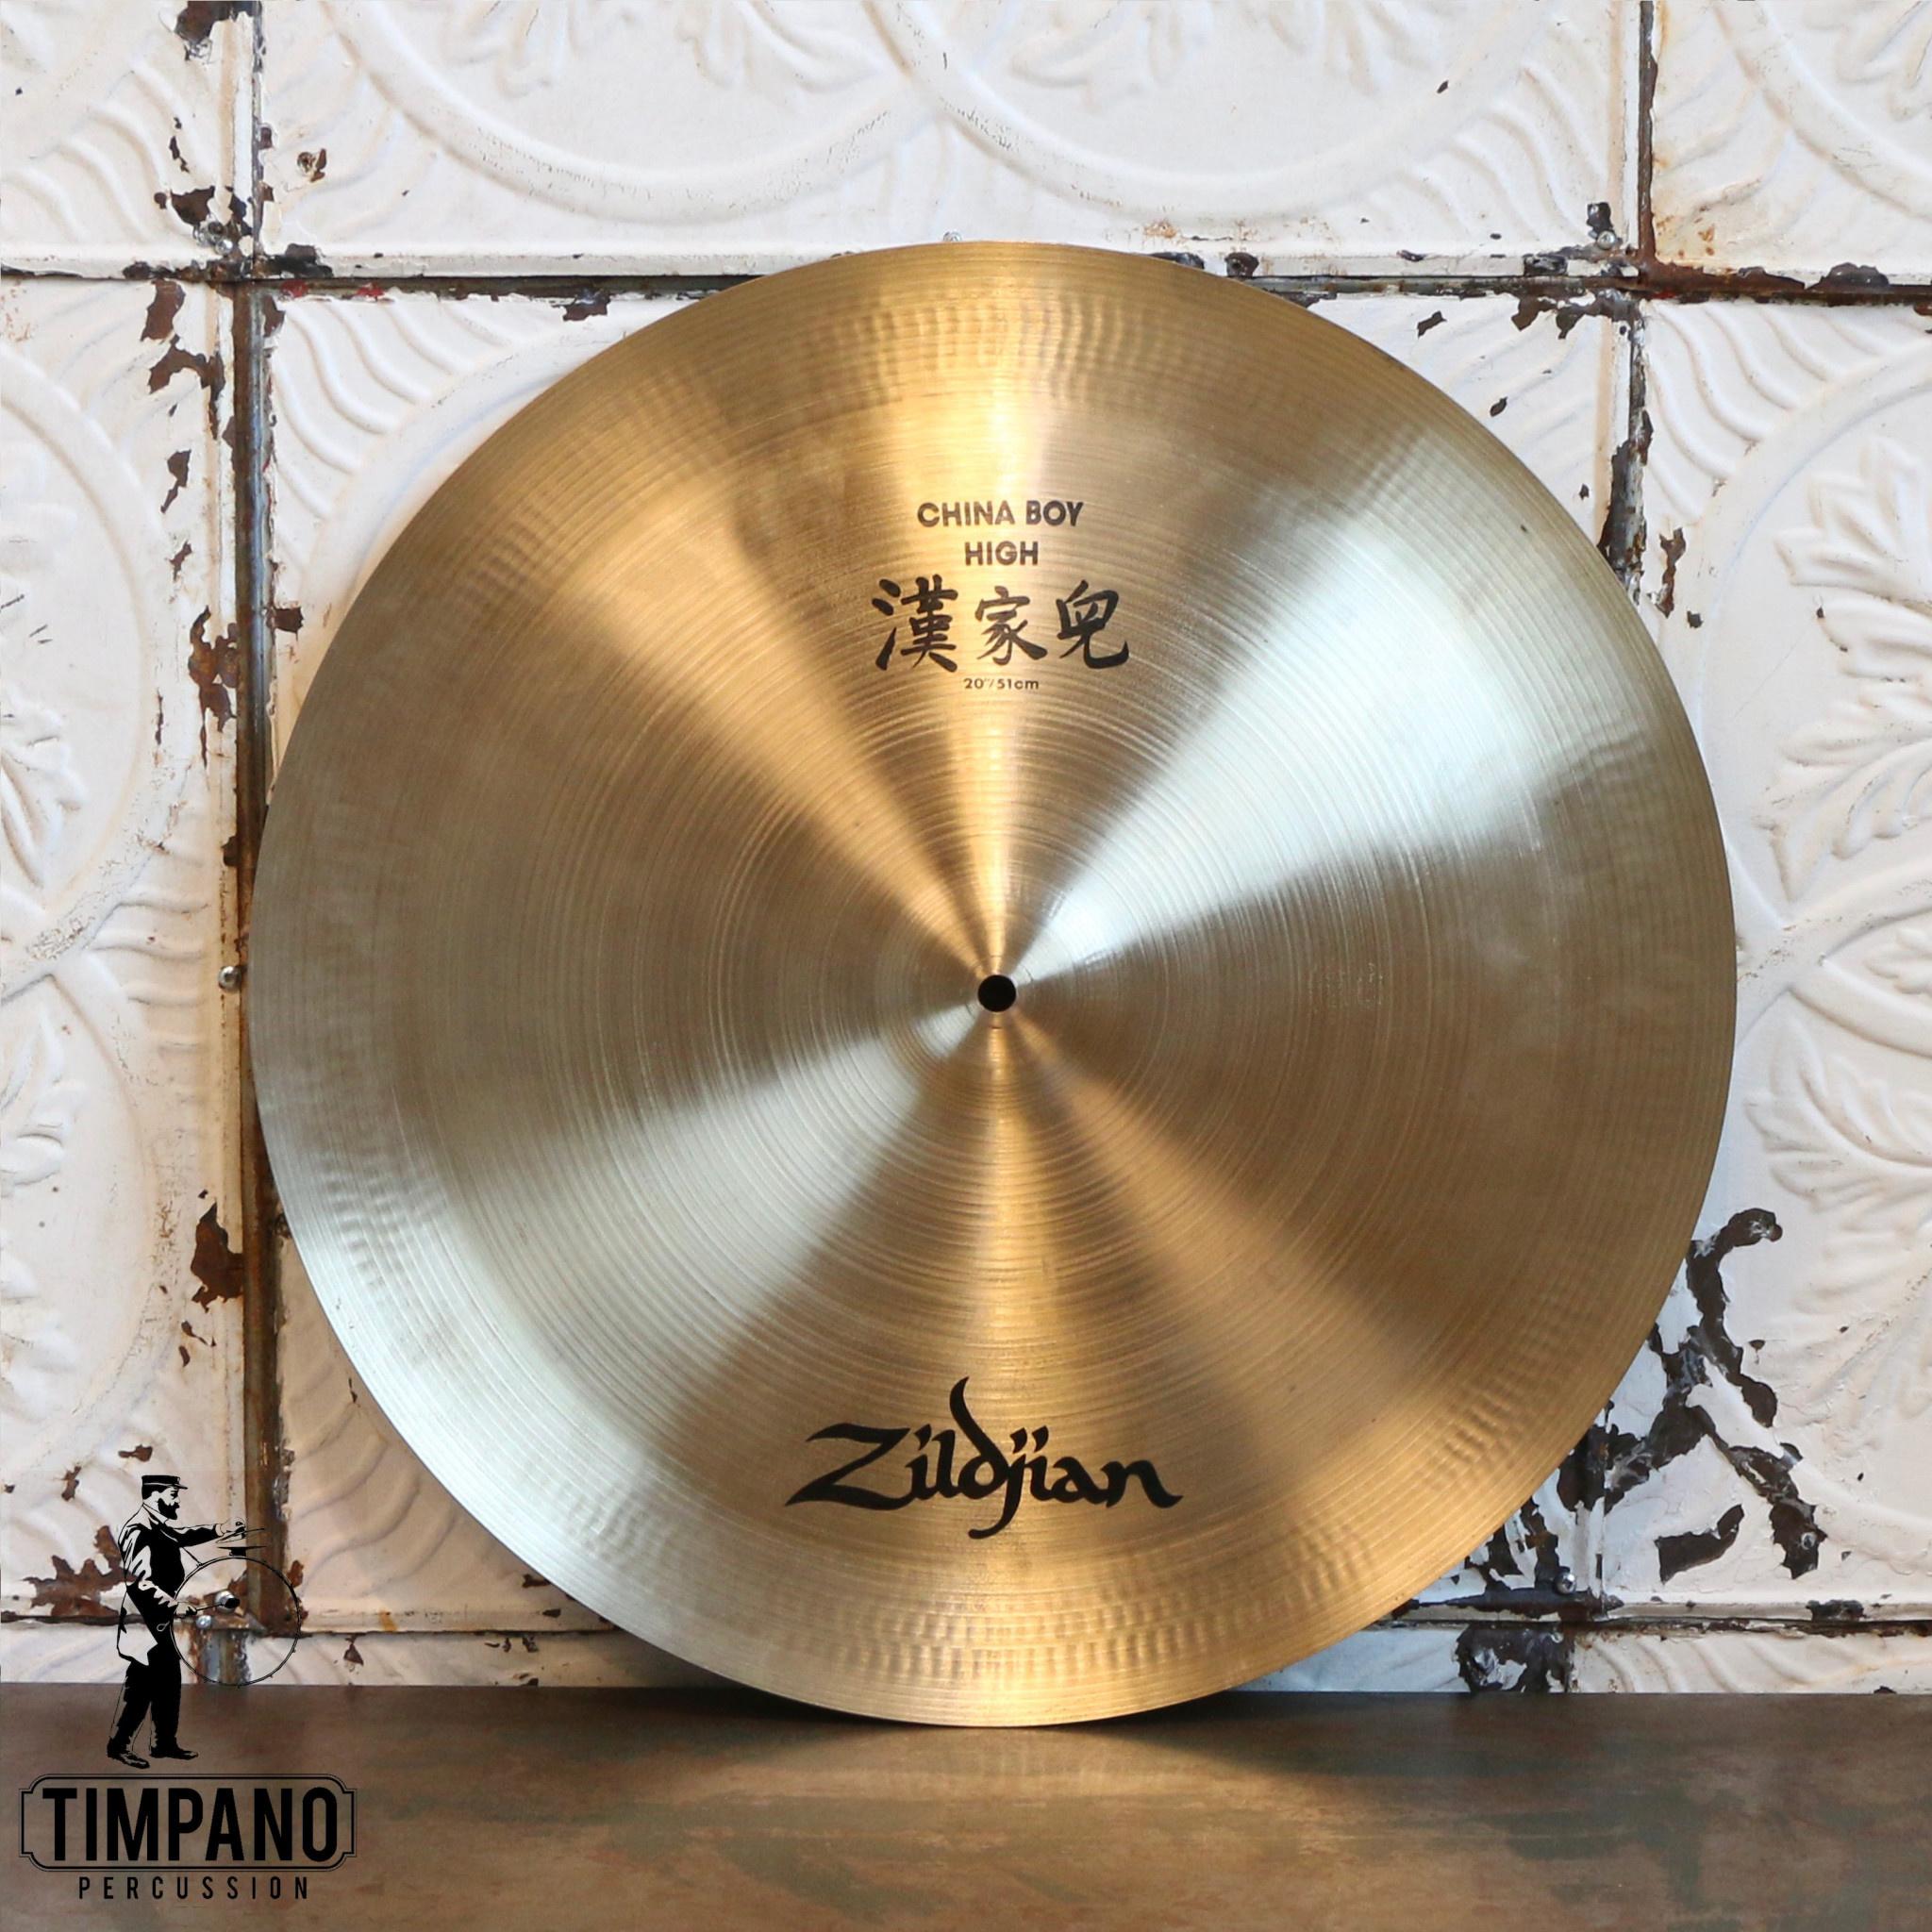 Zildjian Cymbale chinoise usagée Zildjian High Boy 20po